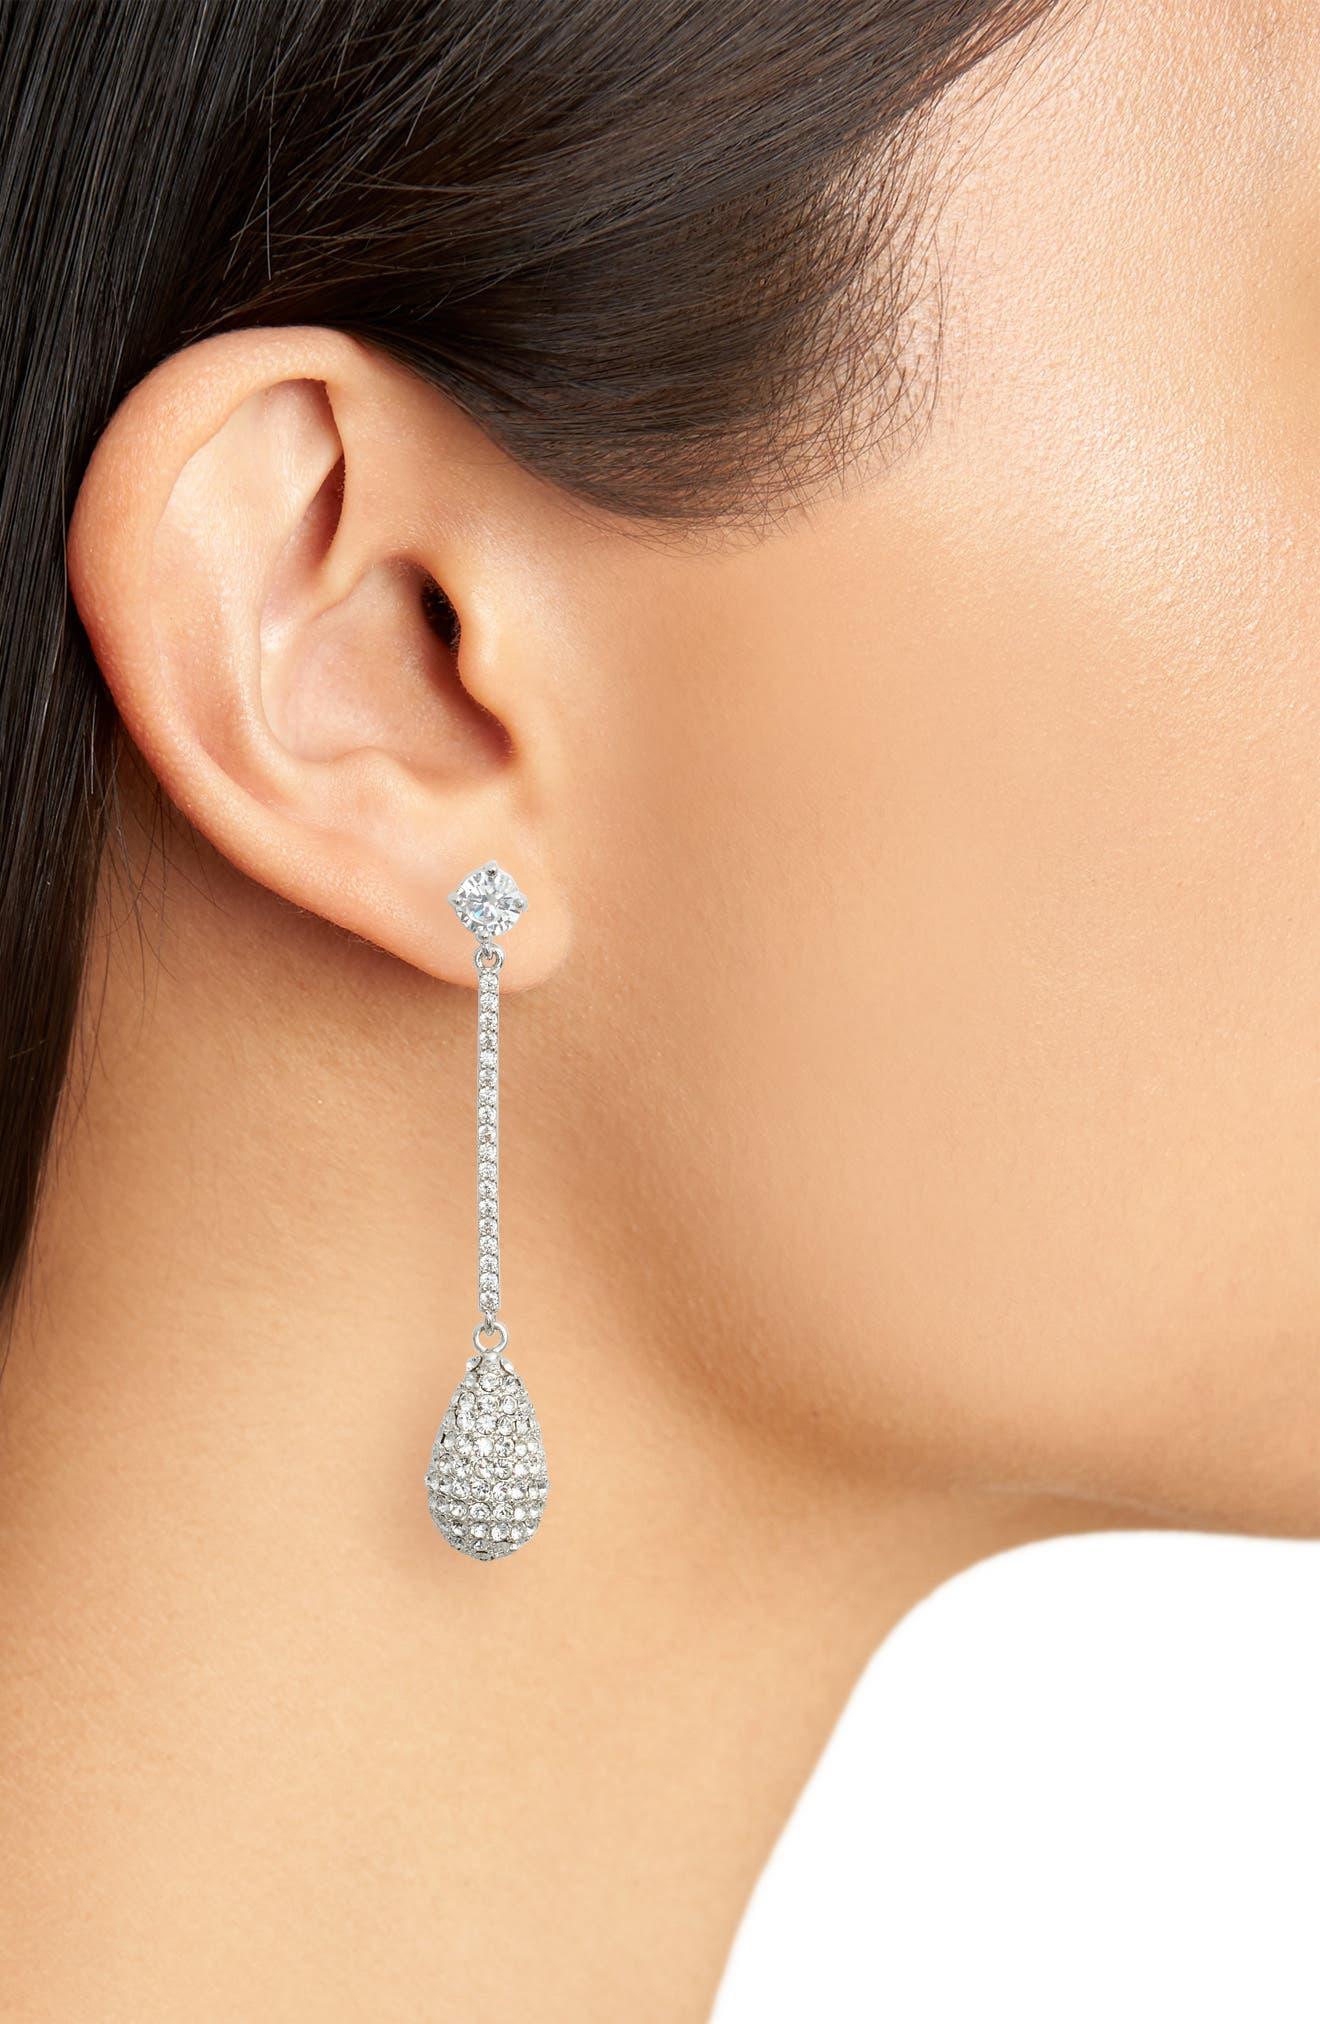 Swarovski Crystal Teardrop Earrings,                             Alternate thumbnail 2, color,                             WHITE/ SILVER